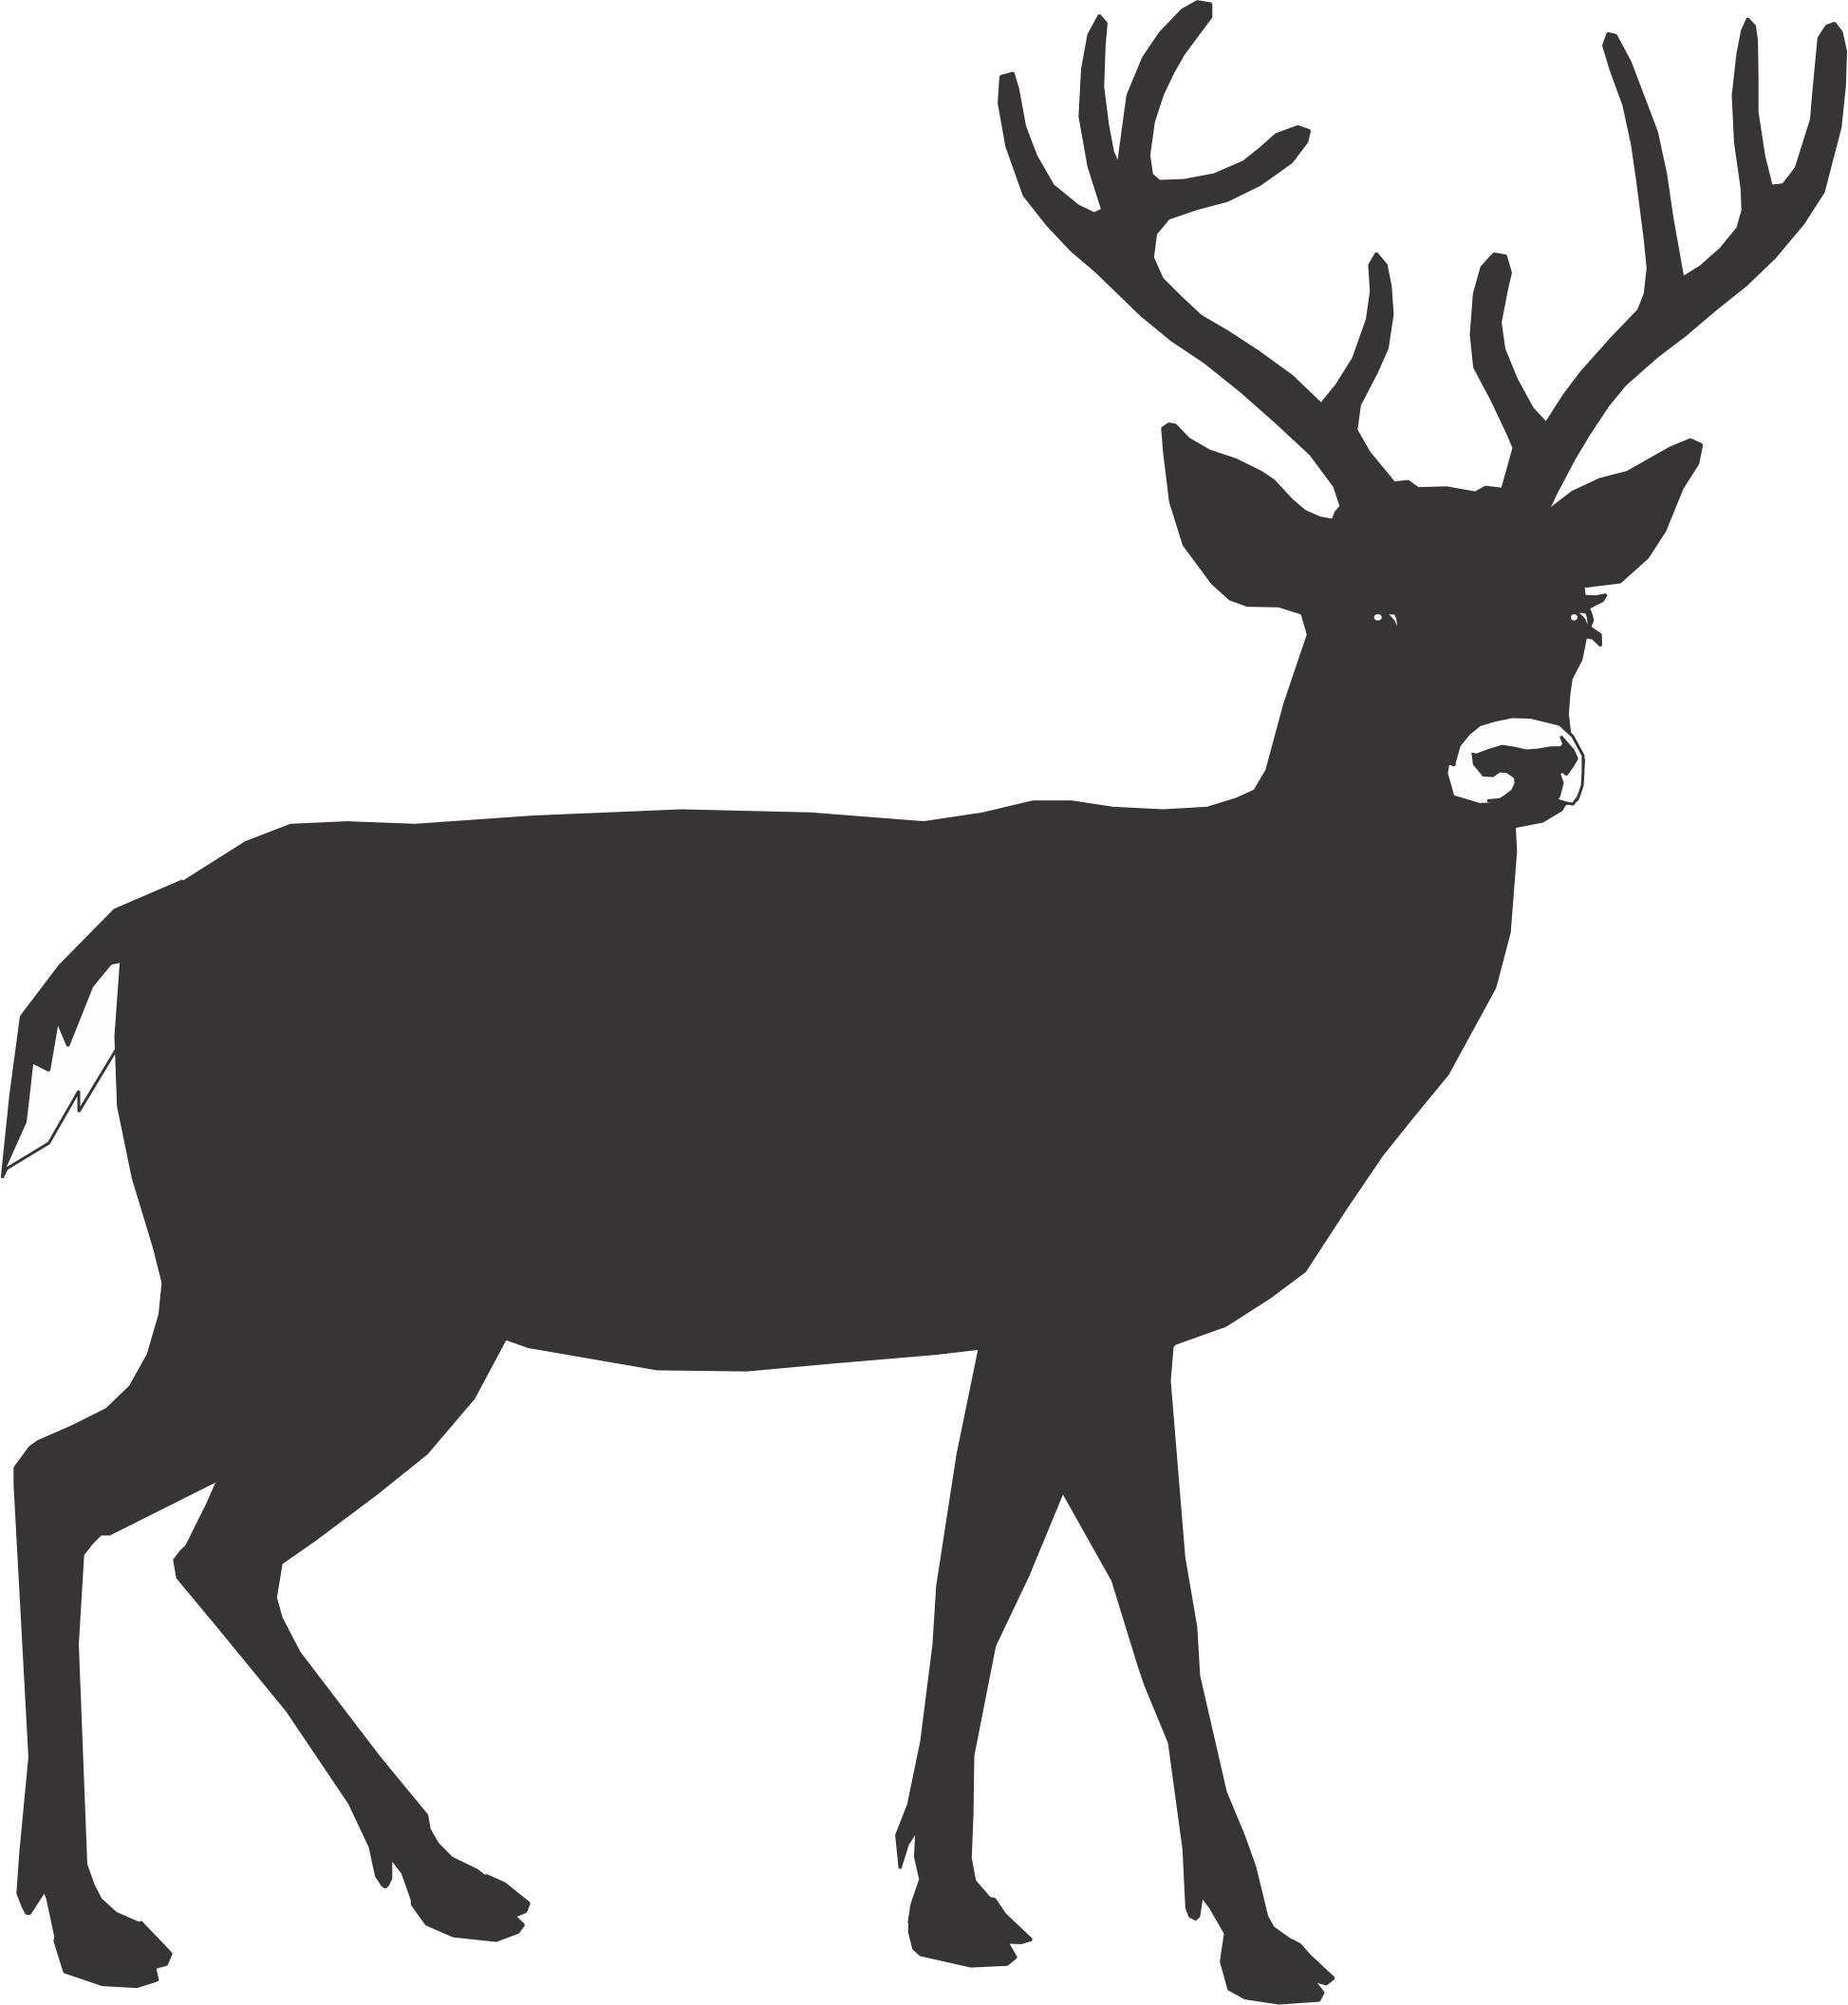 Black deer clipart banner library library Elk Clipart Black And White | Free download best Elk Clipart Black ... banner library library